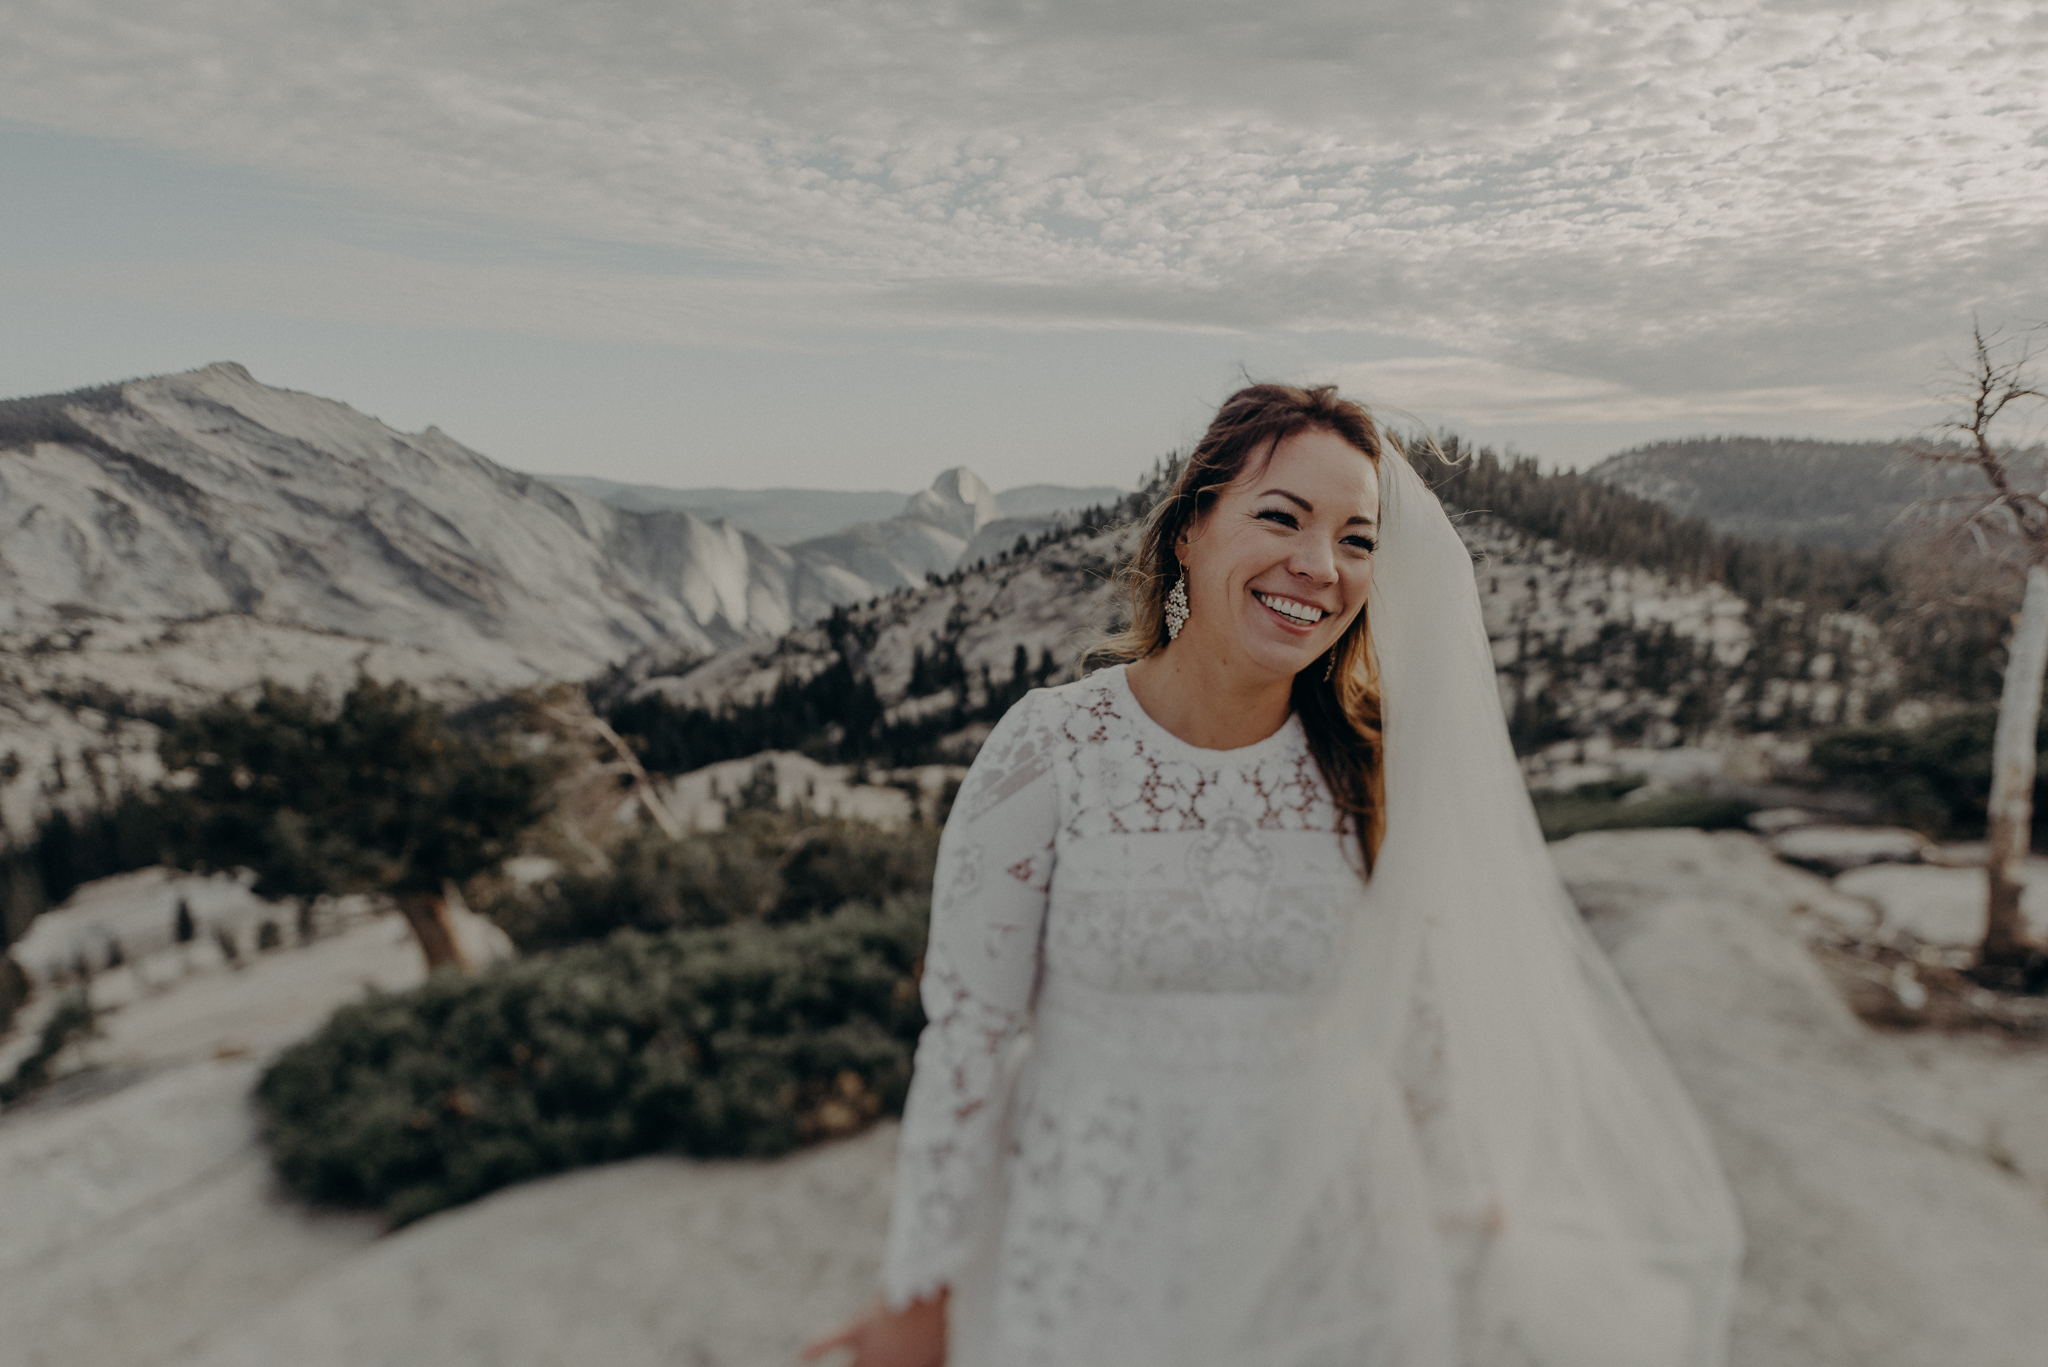 Yosemite Elopement Photographer - Evergreen Lodge Wedding Photographer - IsaiahAndTaylor.com-010.jpg